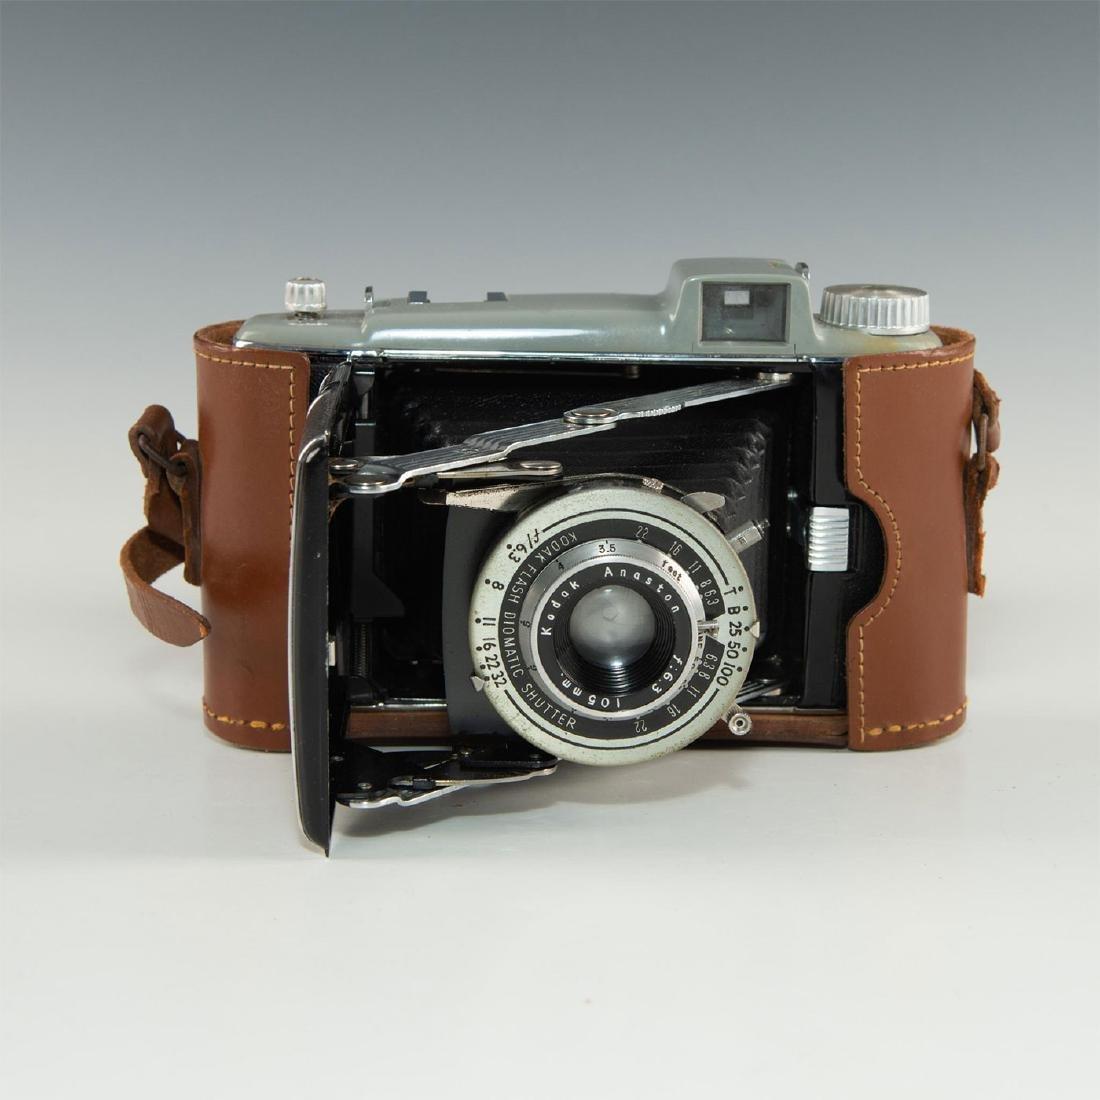 Antique Kodak Tourist Folding Camera Lens Wine Bottle Stopper Wine Accessory